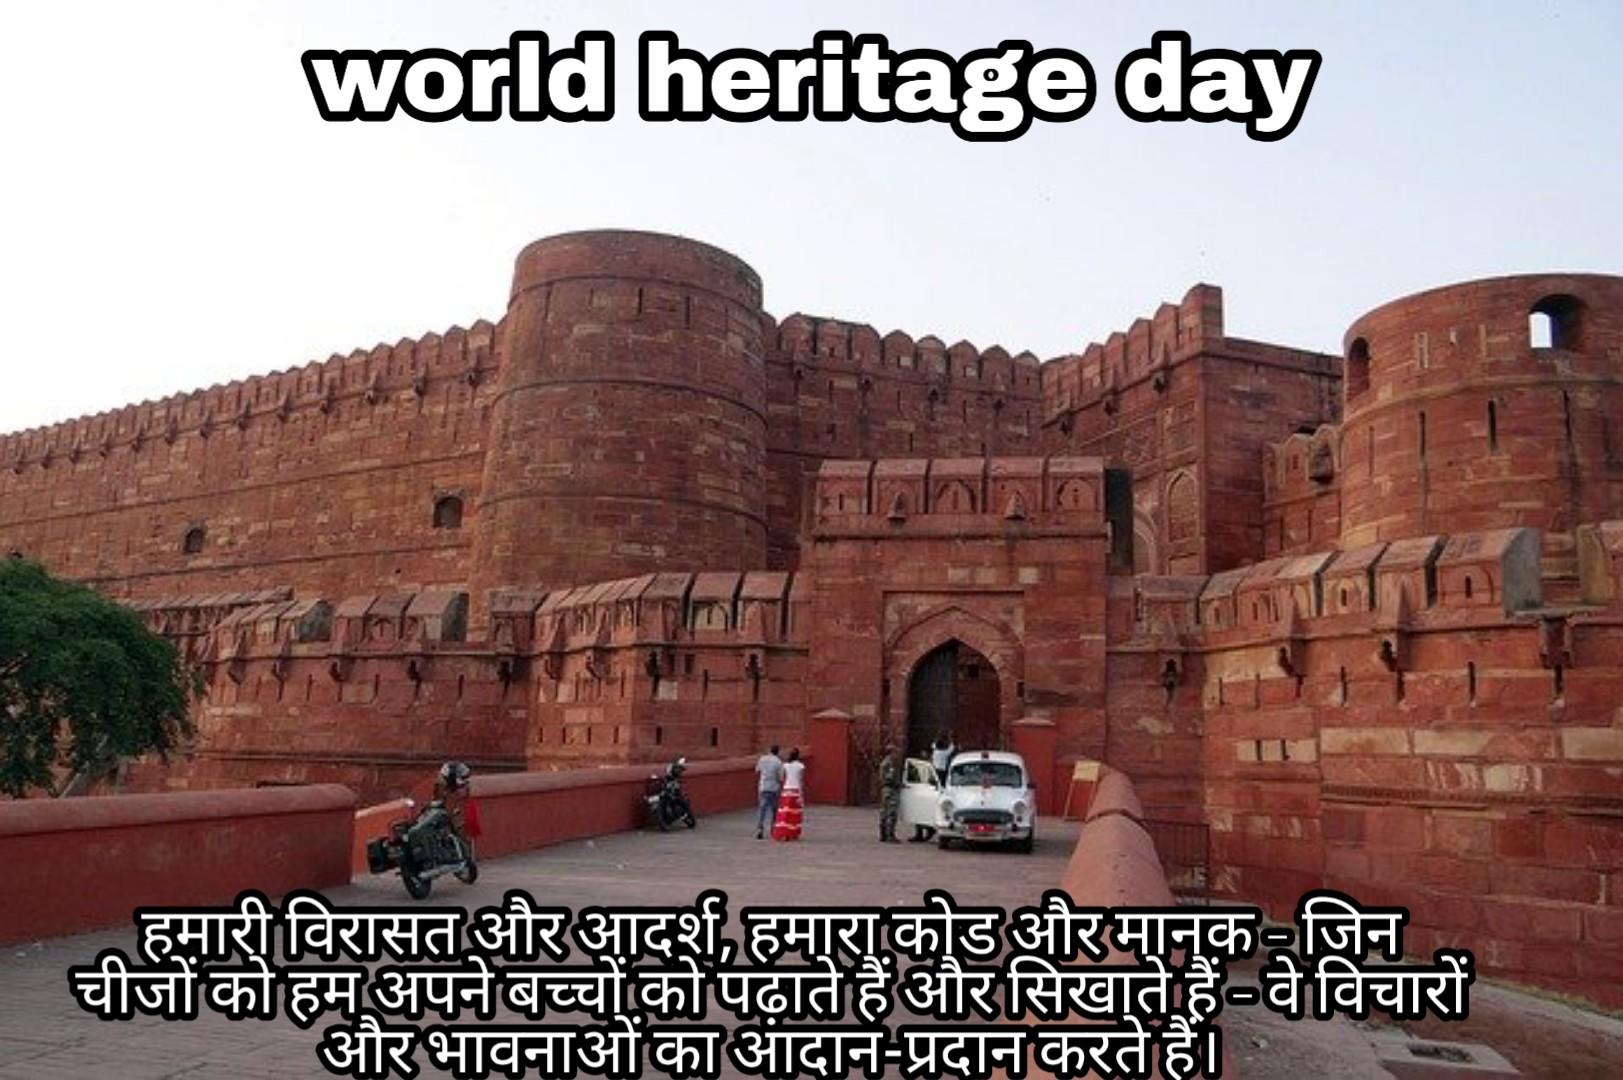 World heritage day wishes shayari quotes sms